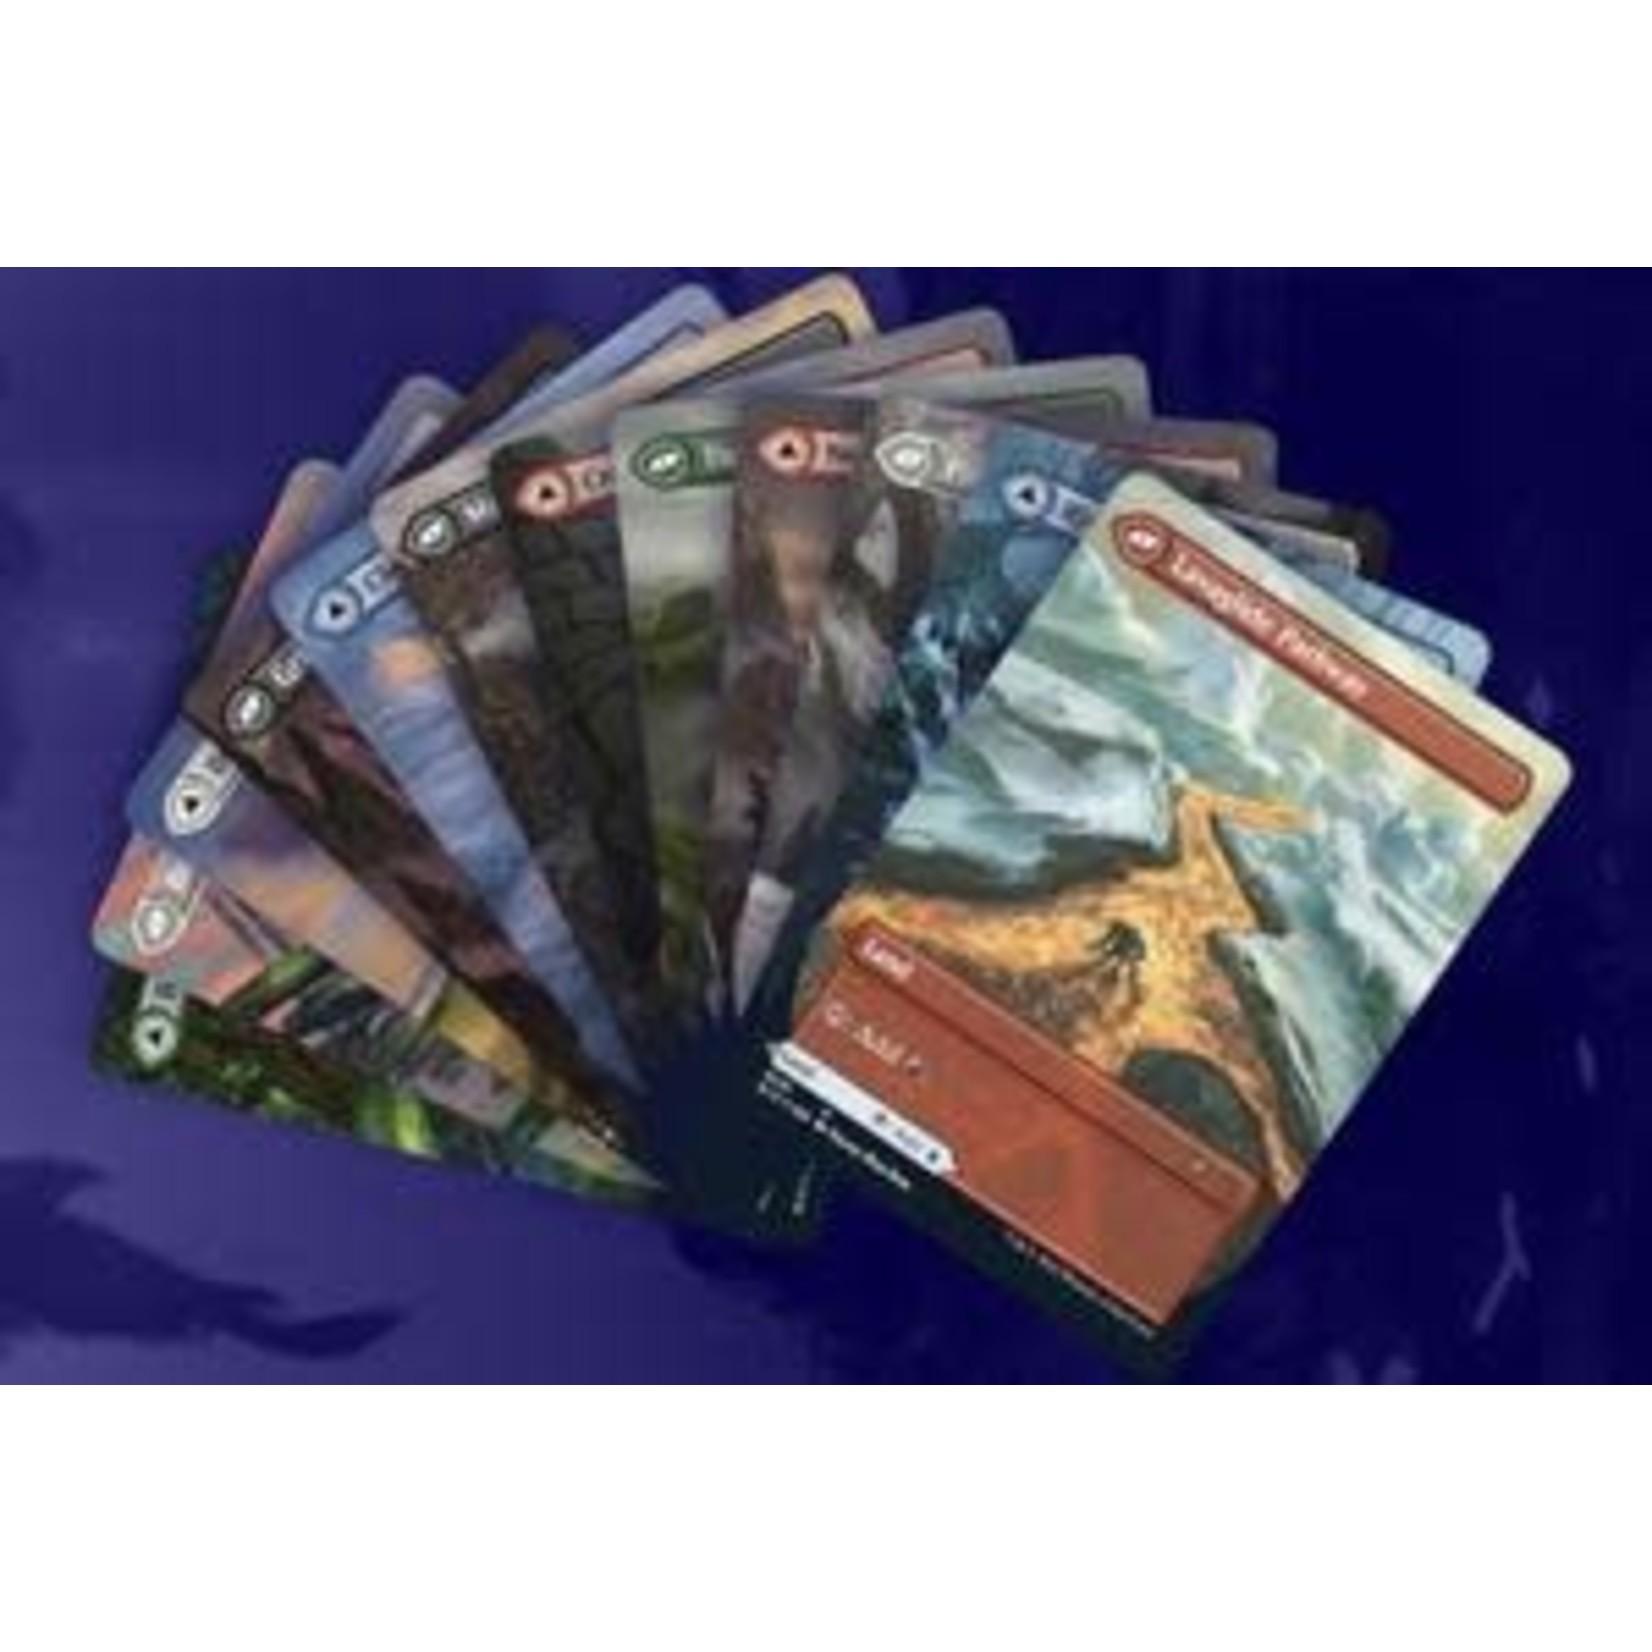 Wizards of the Coast Secret Lair: Ultimate Edition 2 Hidden Pathways